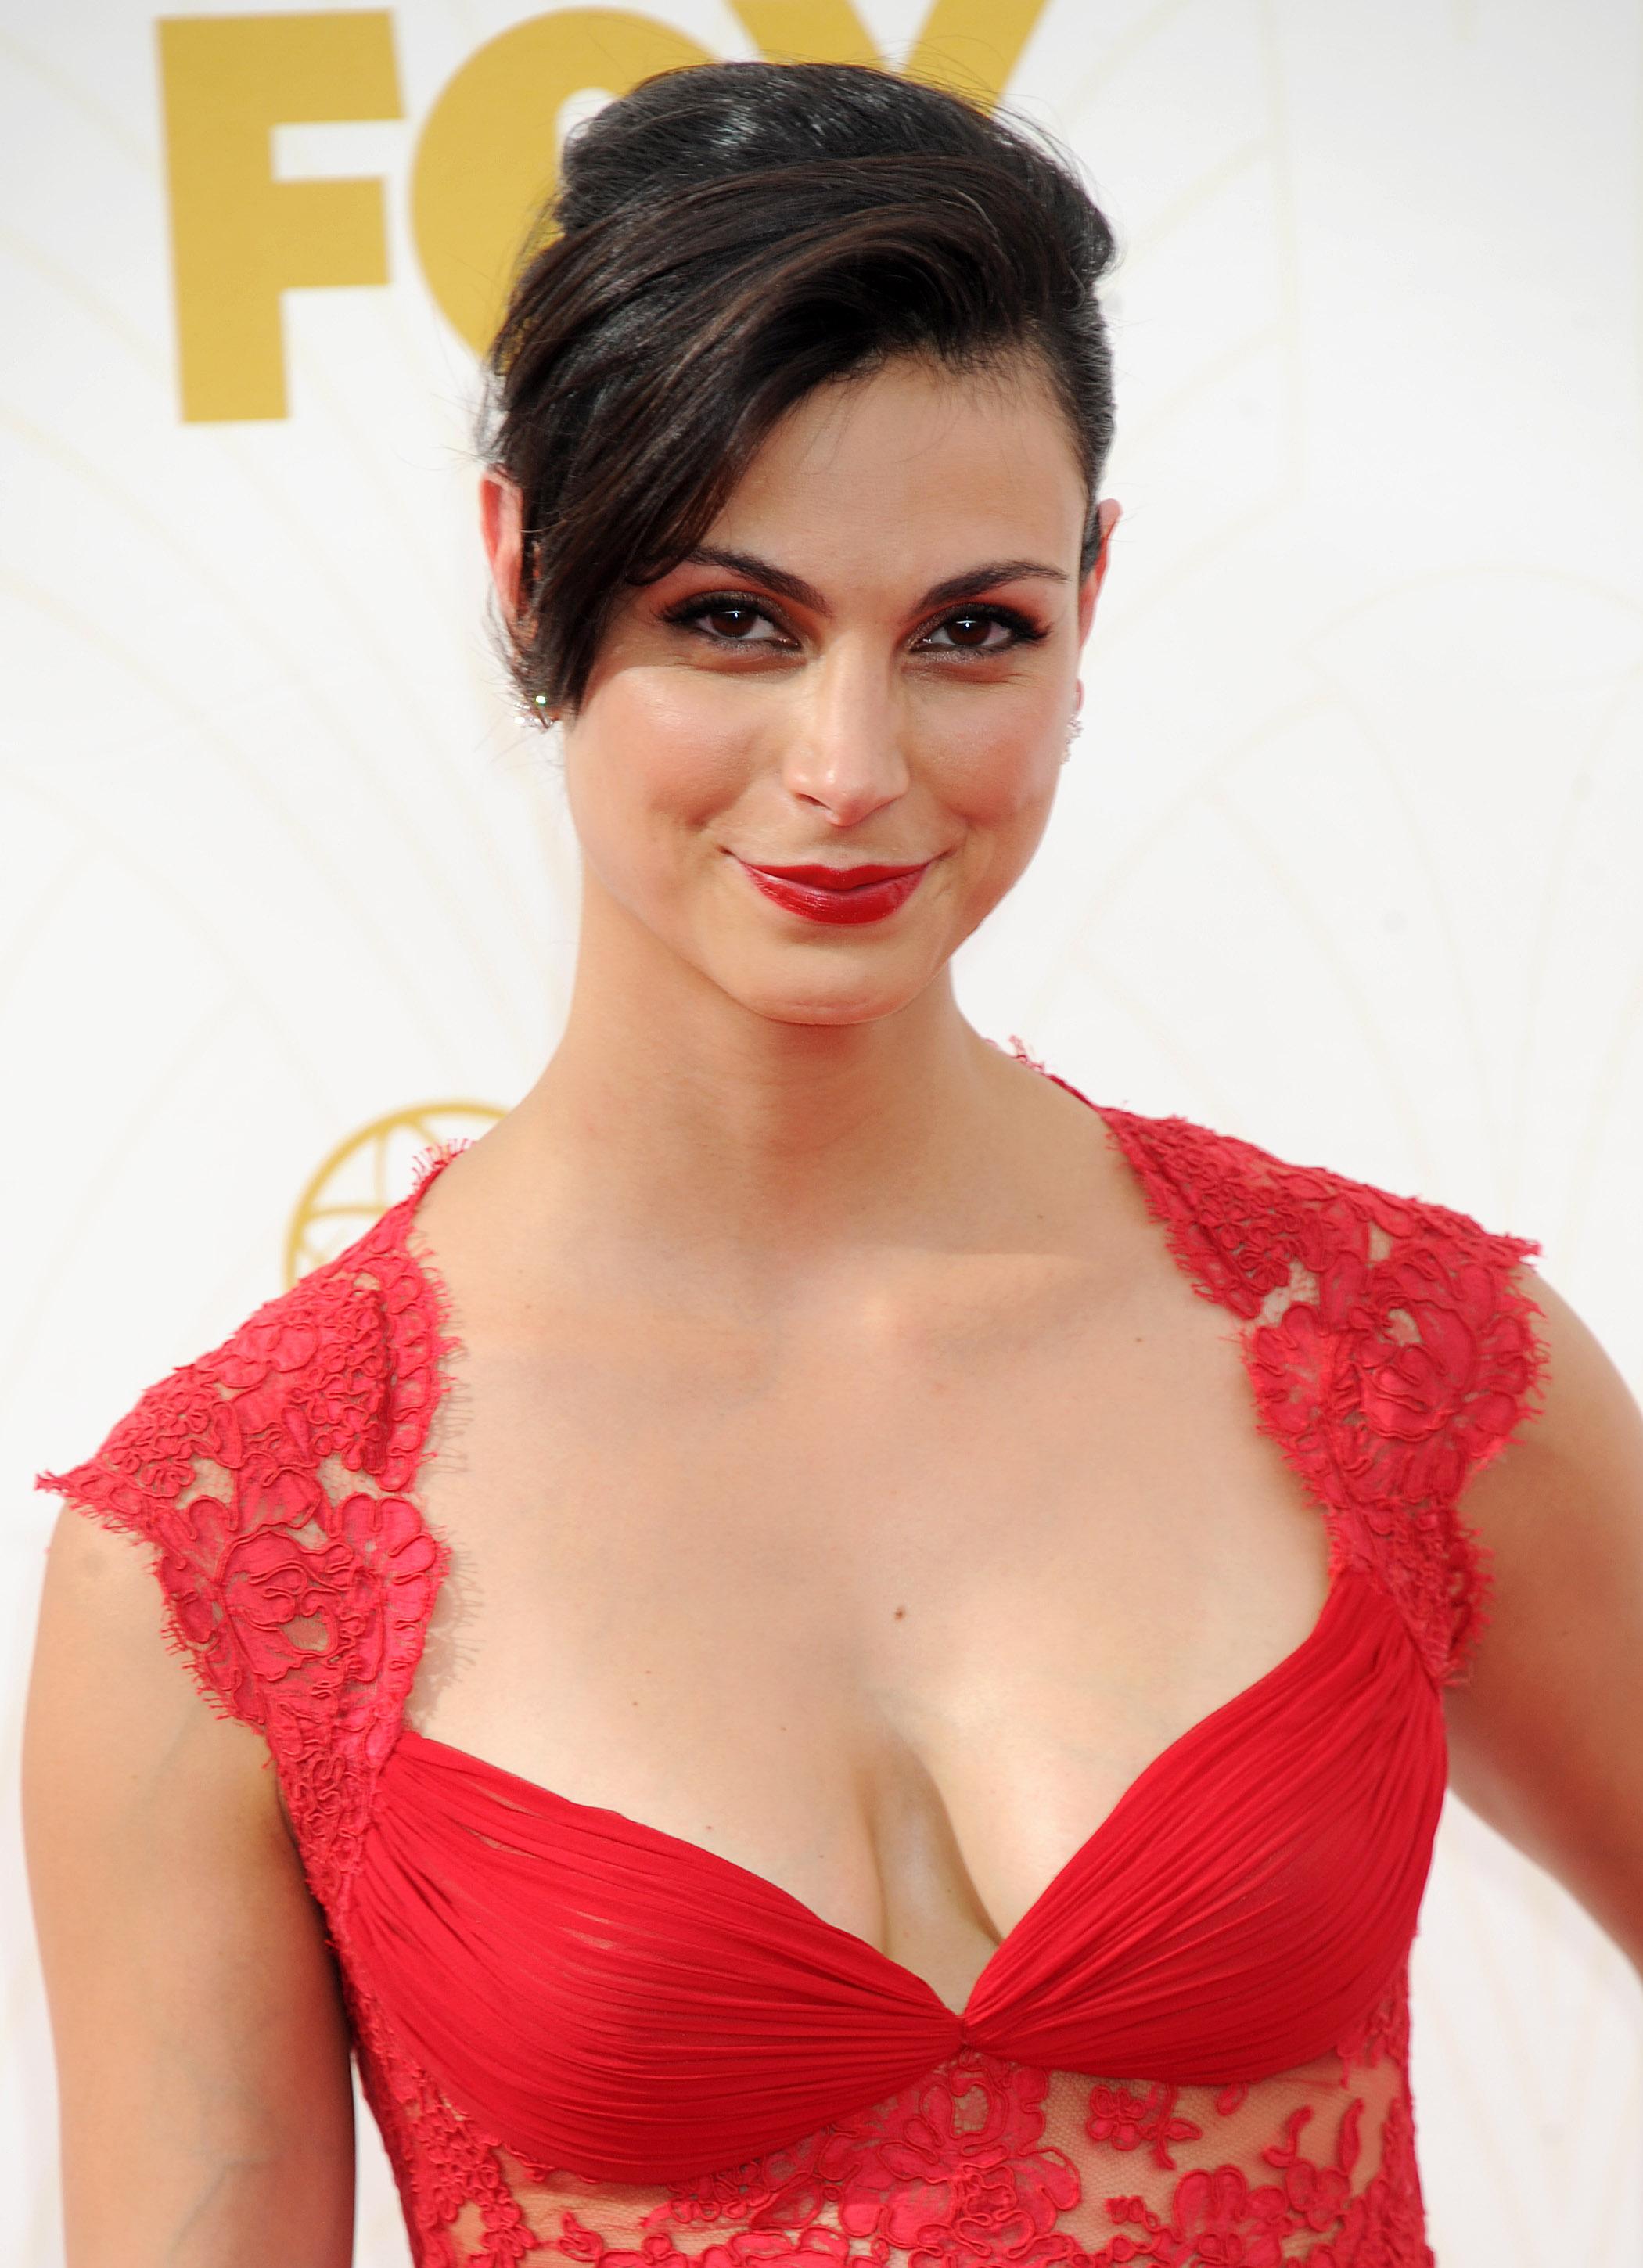 Morena Baccarin At The 2015 Emmy Awards Sascha Breuer